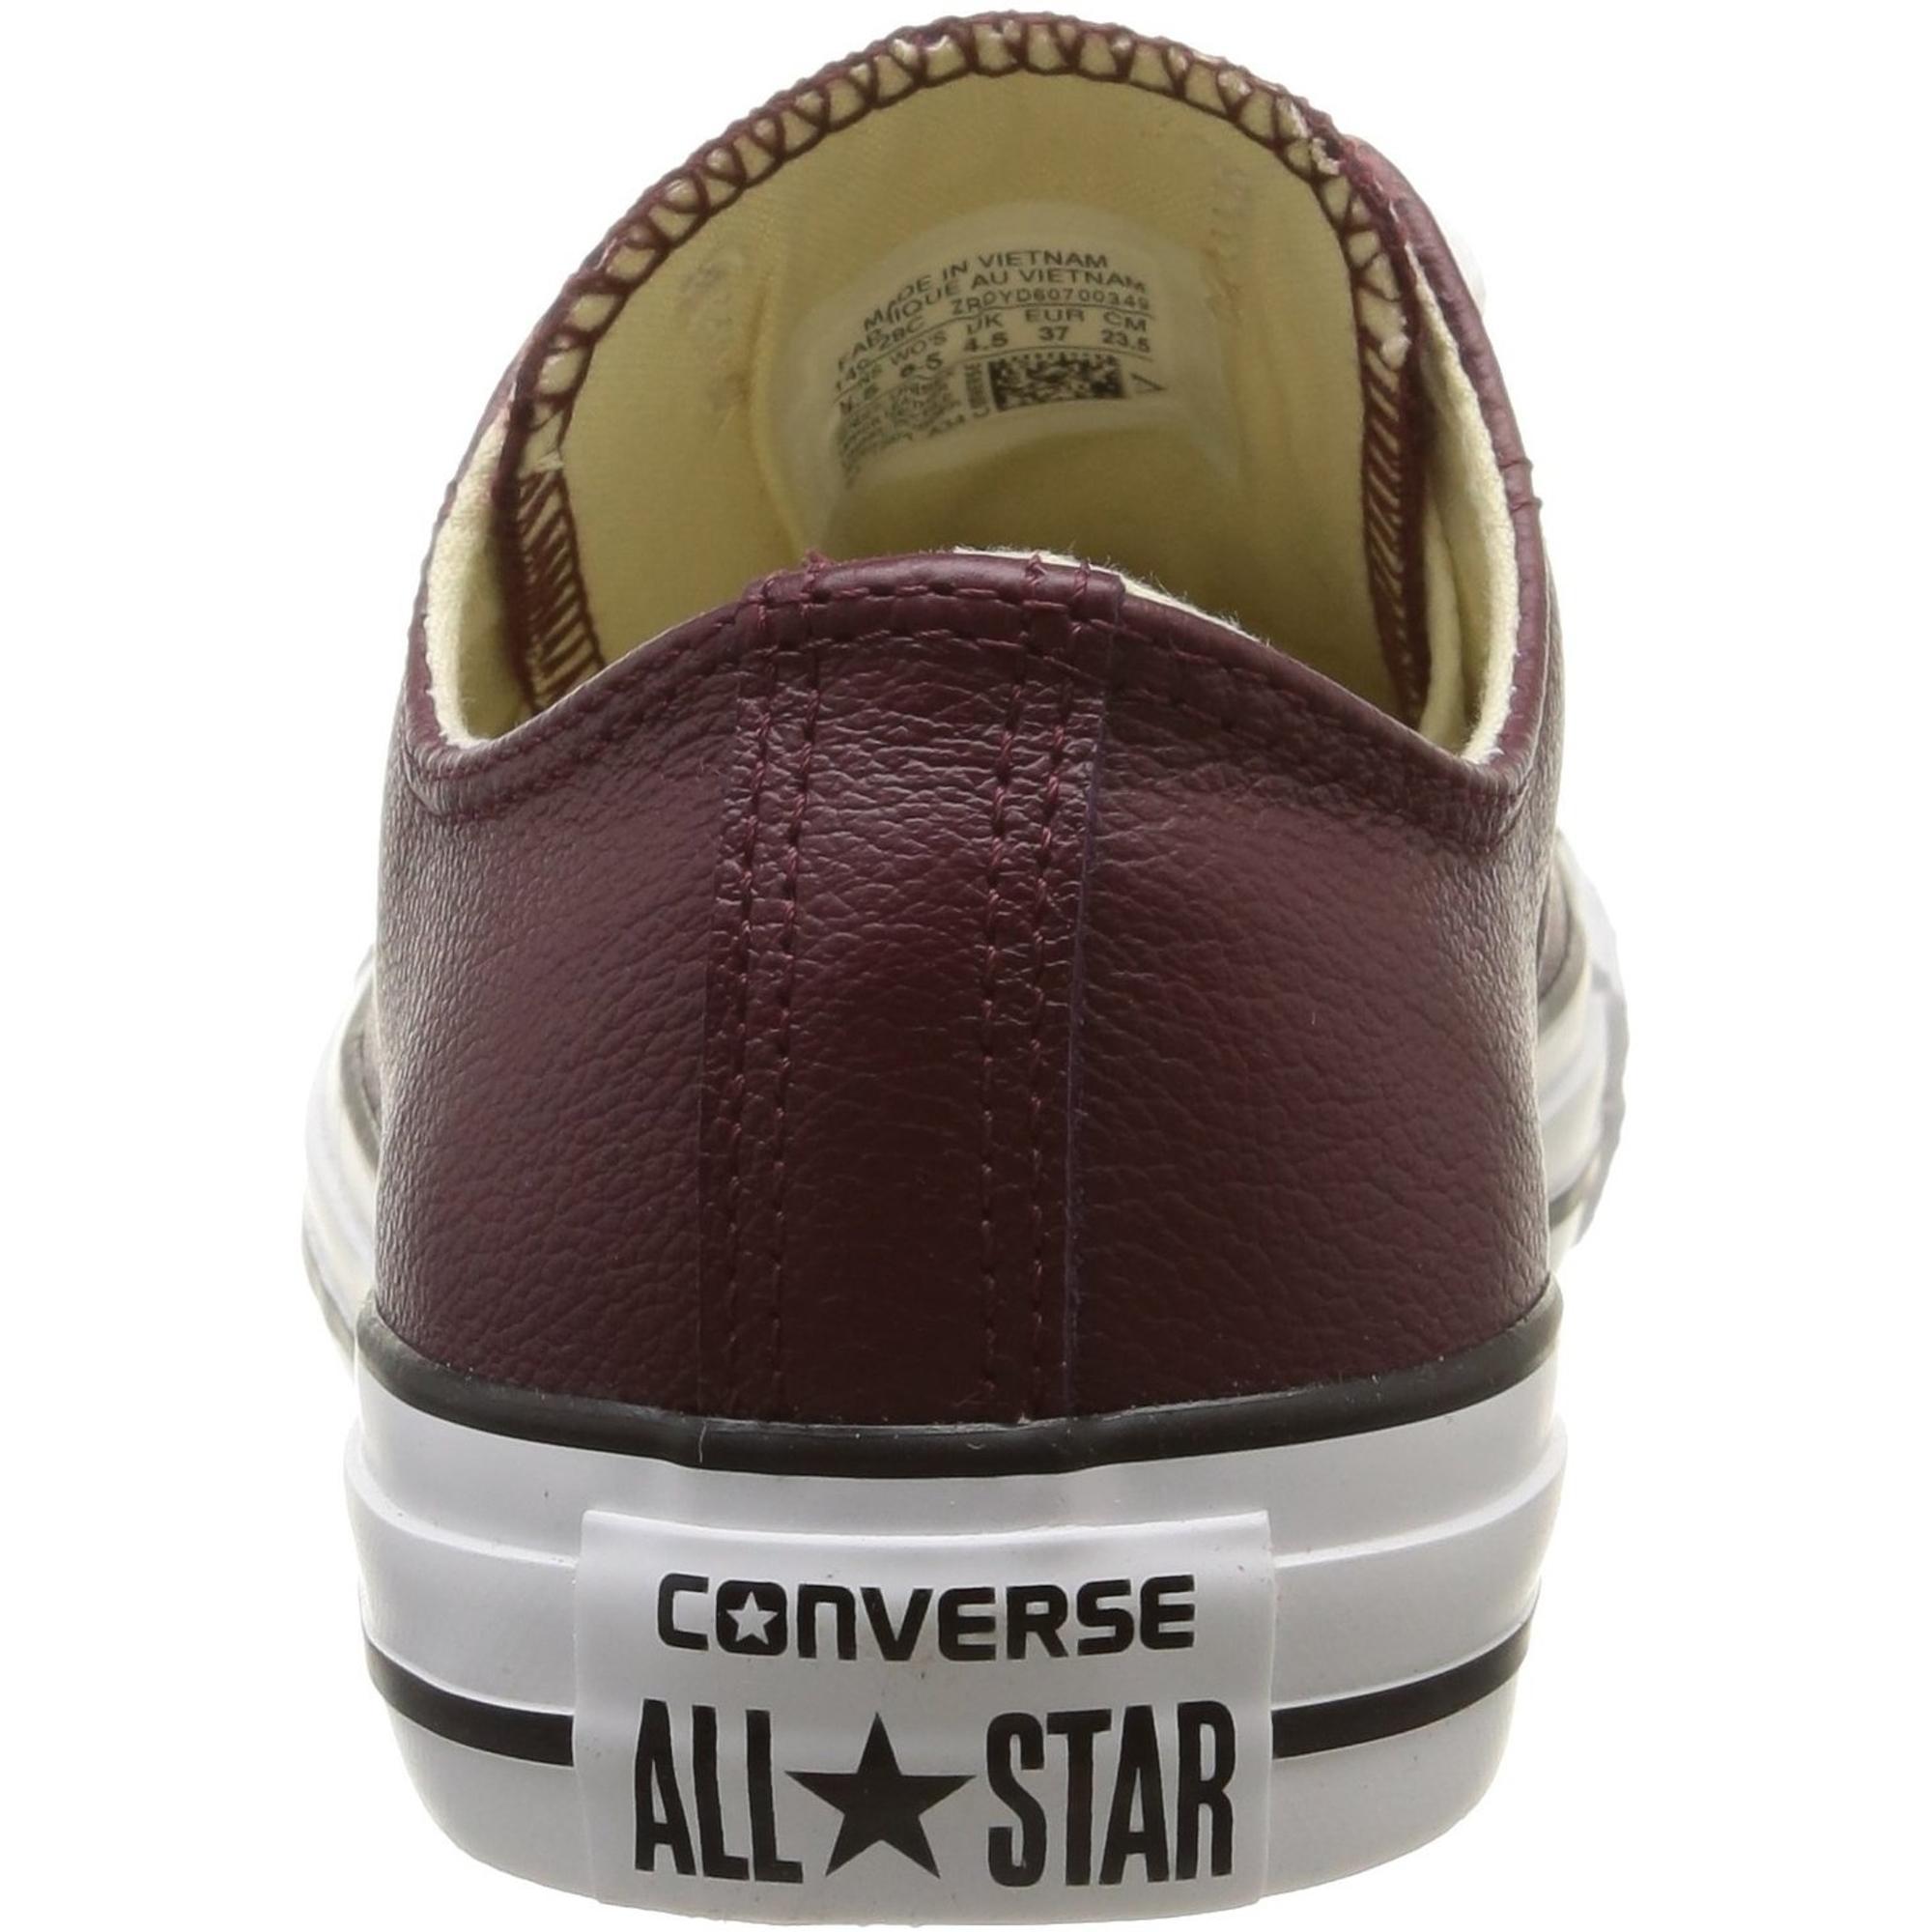 Converse Chuck Taylor All Star Ox Deep Bordeaux Leather Adult